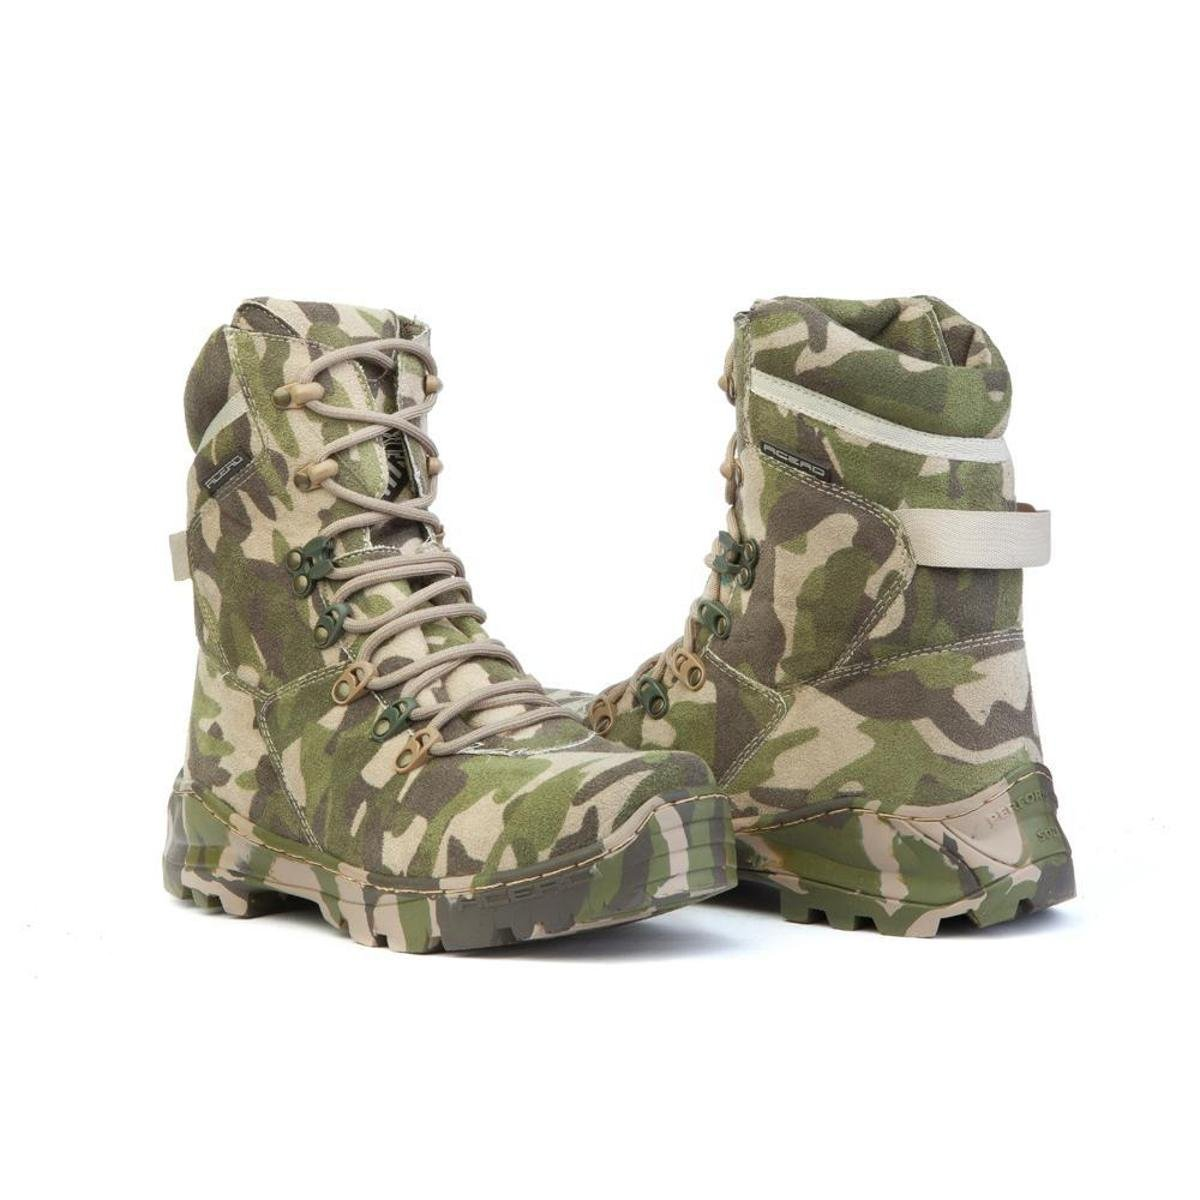 botas converse camufladas